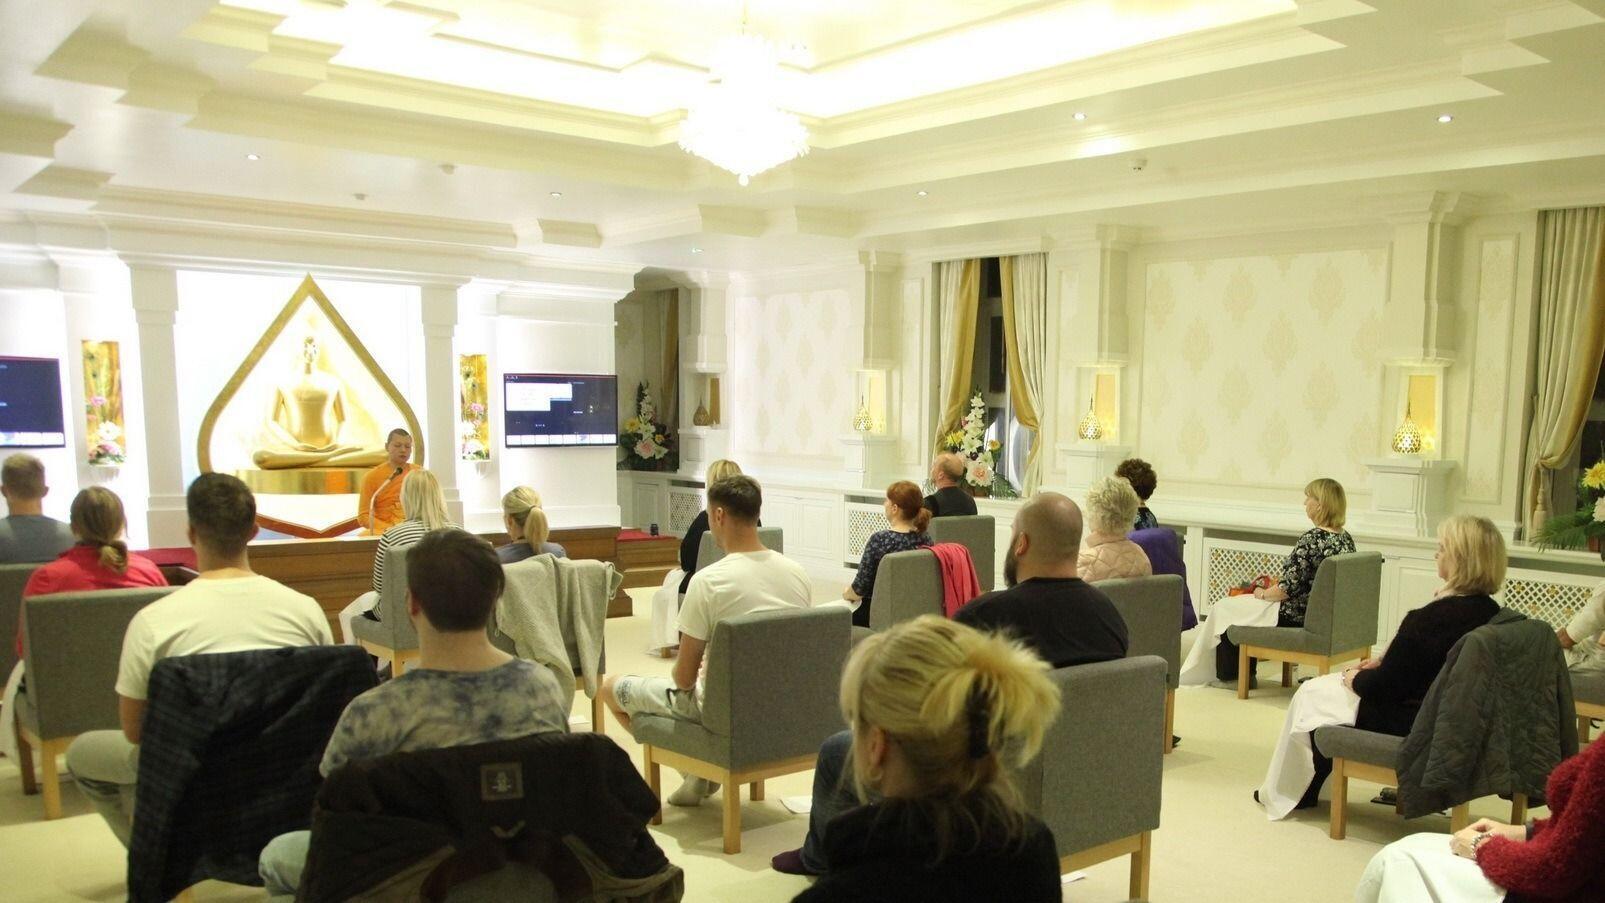 Buddhist chanting and meditation (meditation for intermediates)